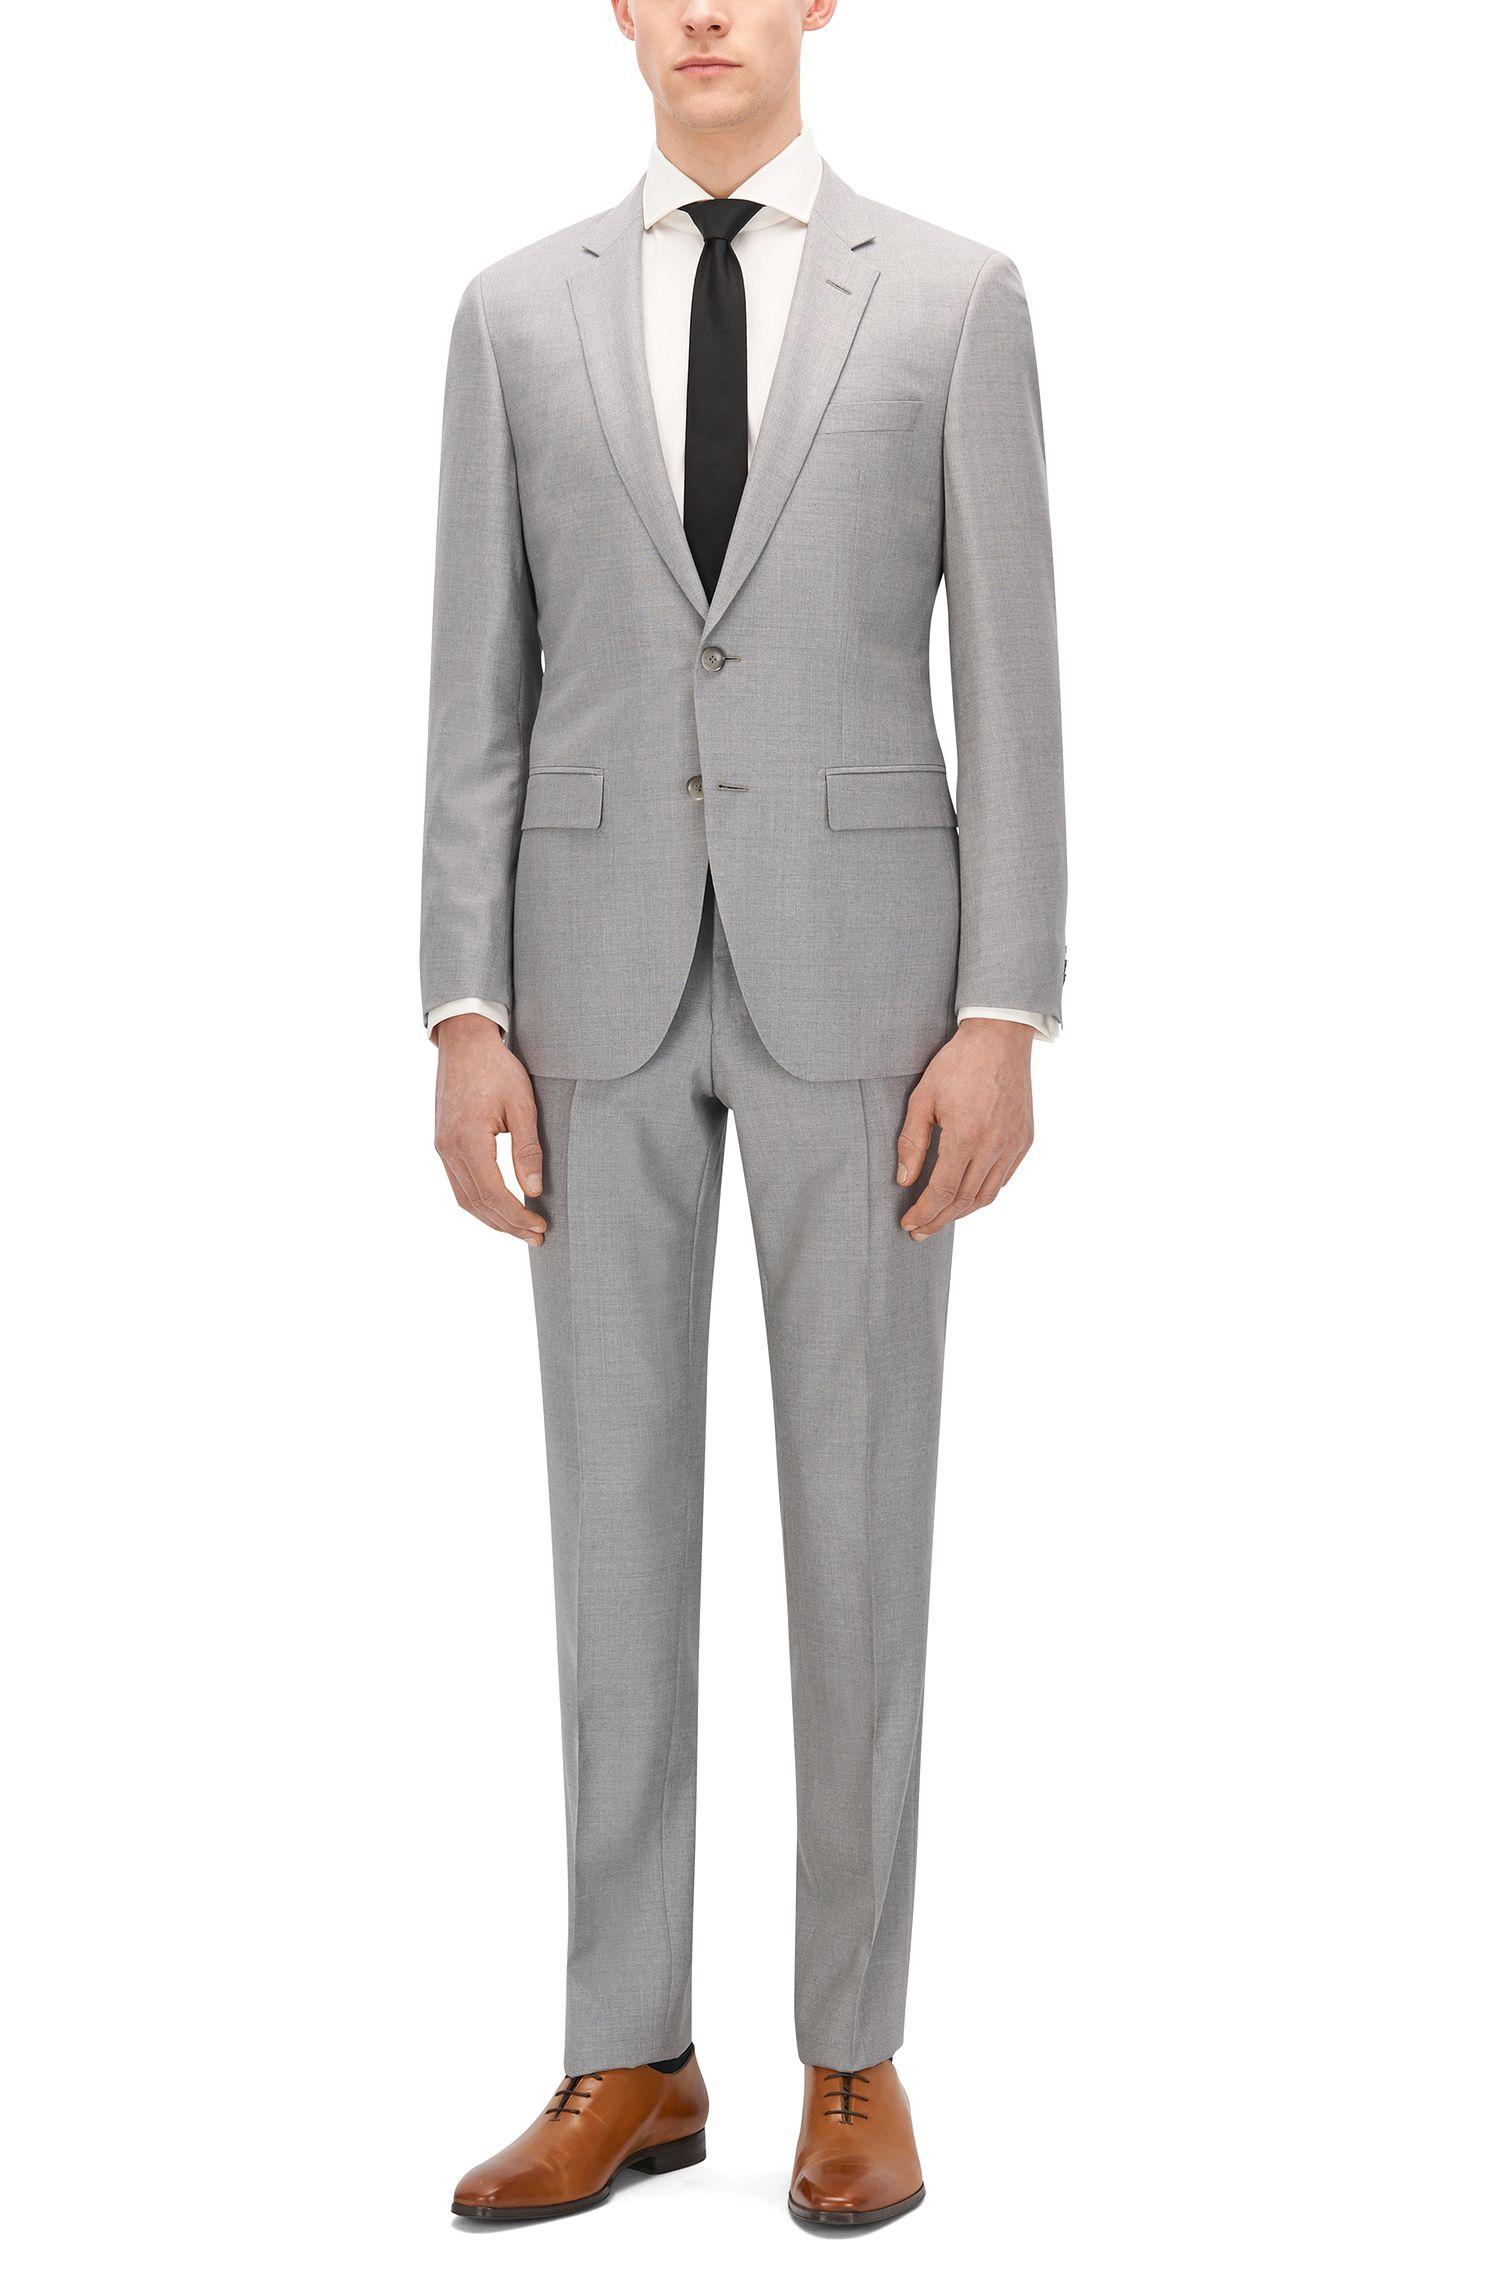 Italian Calfskin Oxford Dress Shoe | T-Club Oxfr ltpt, Brown